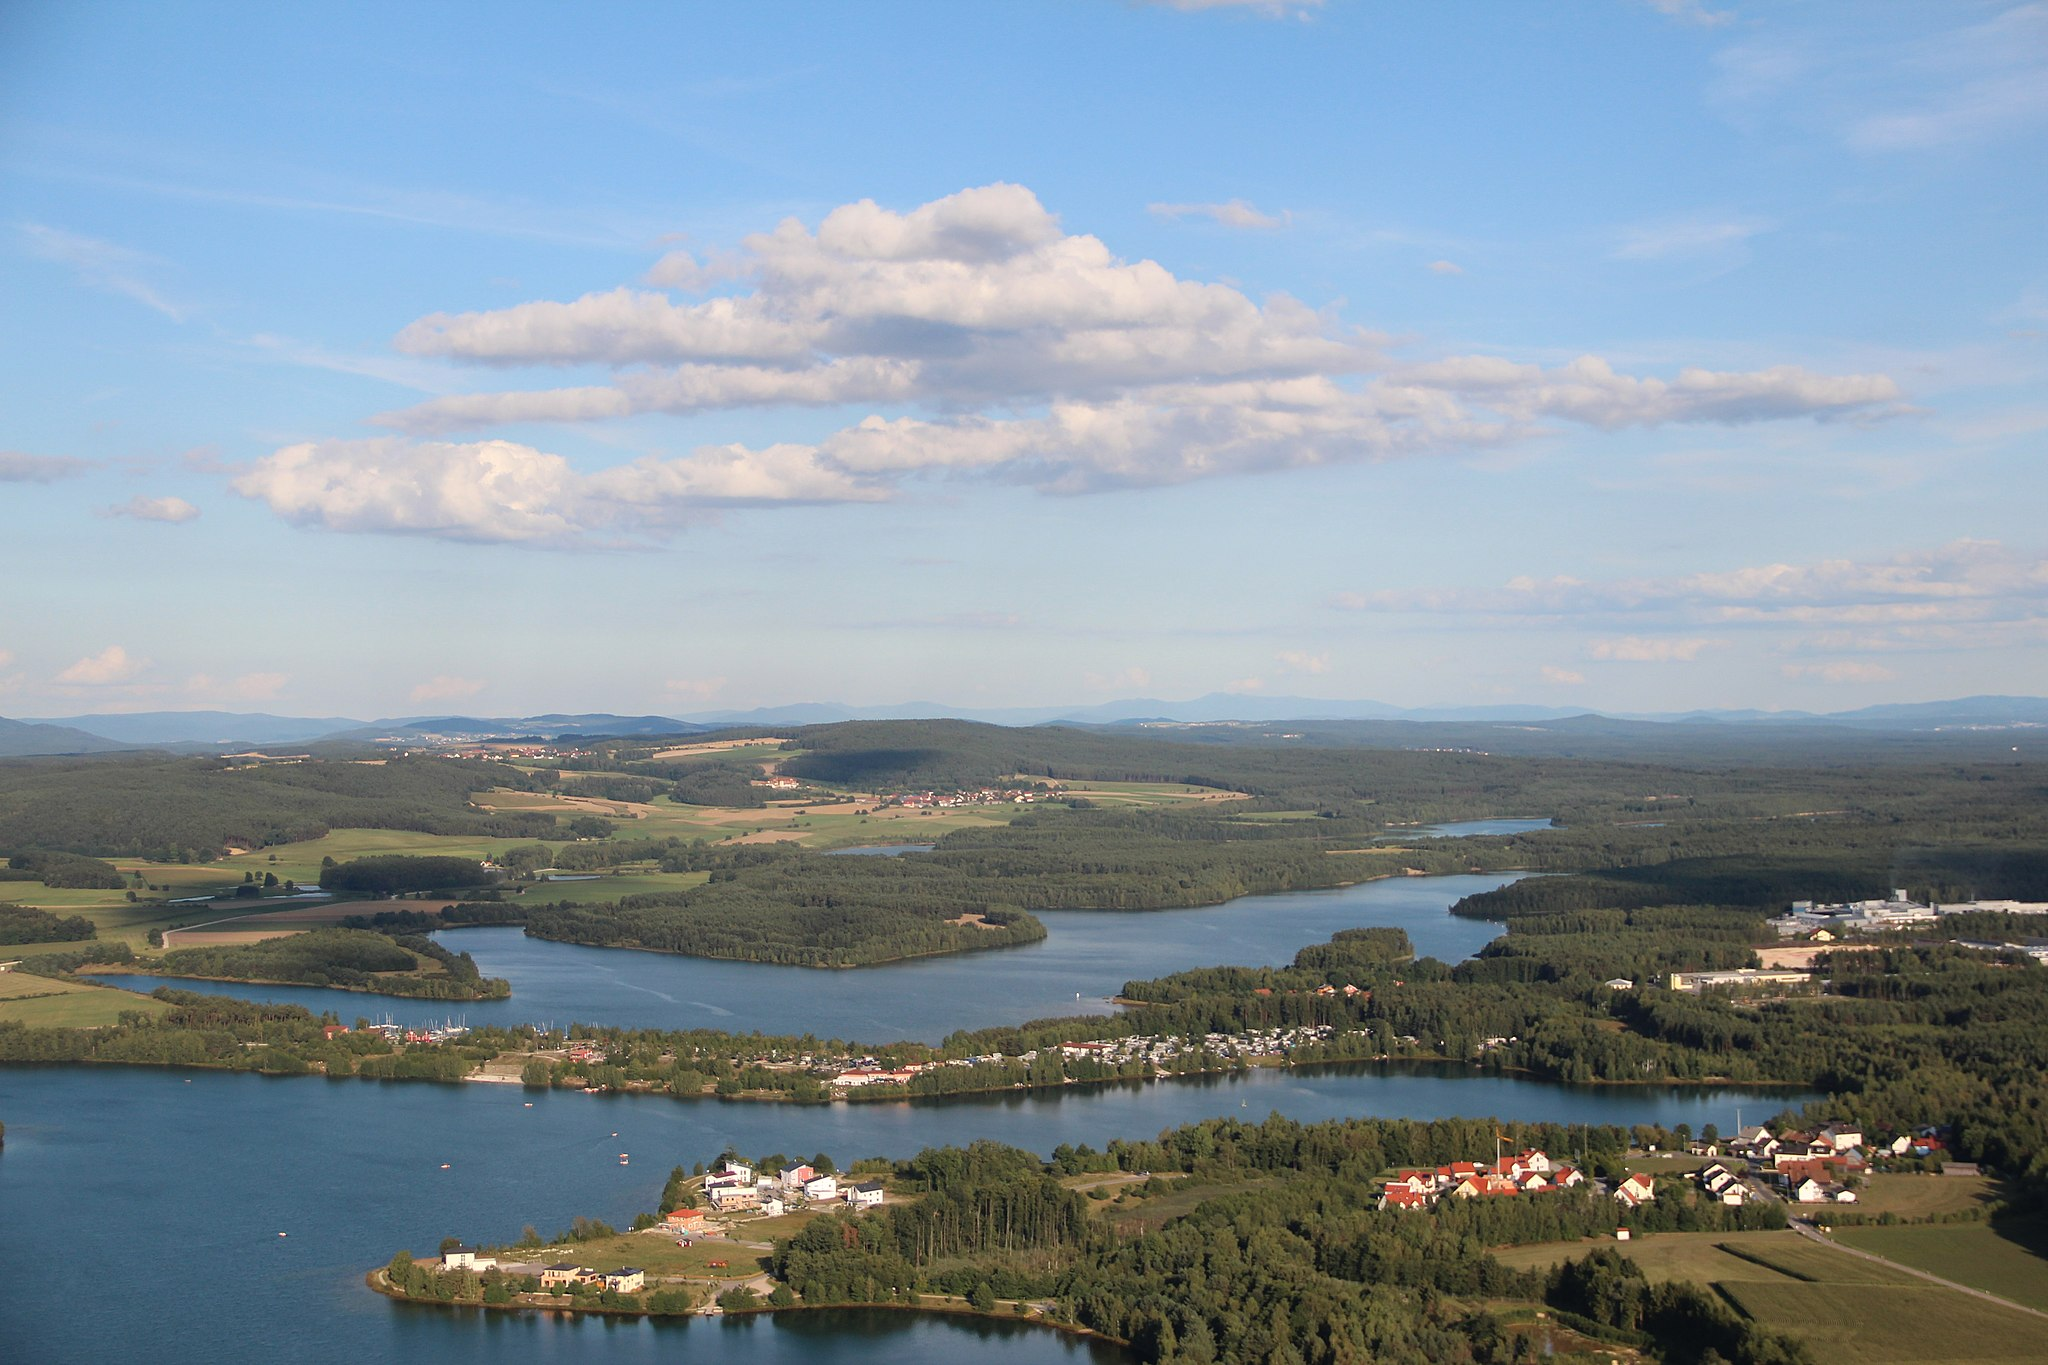 Oberpfälzer Seenland 2012 03